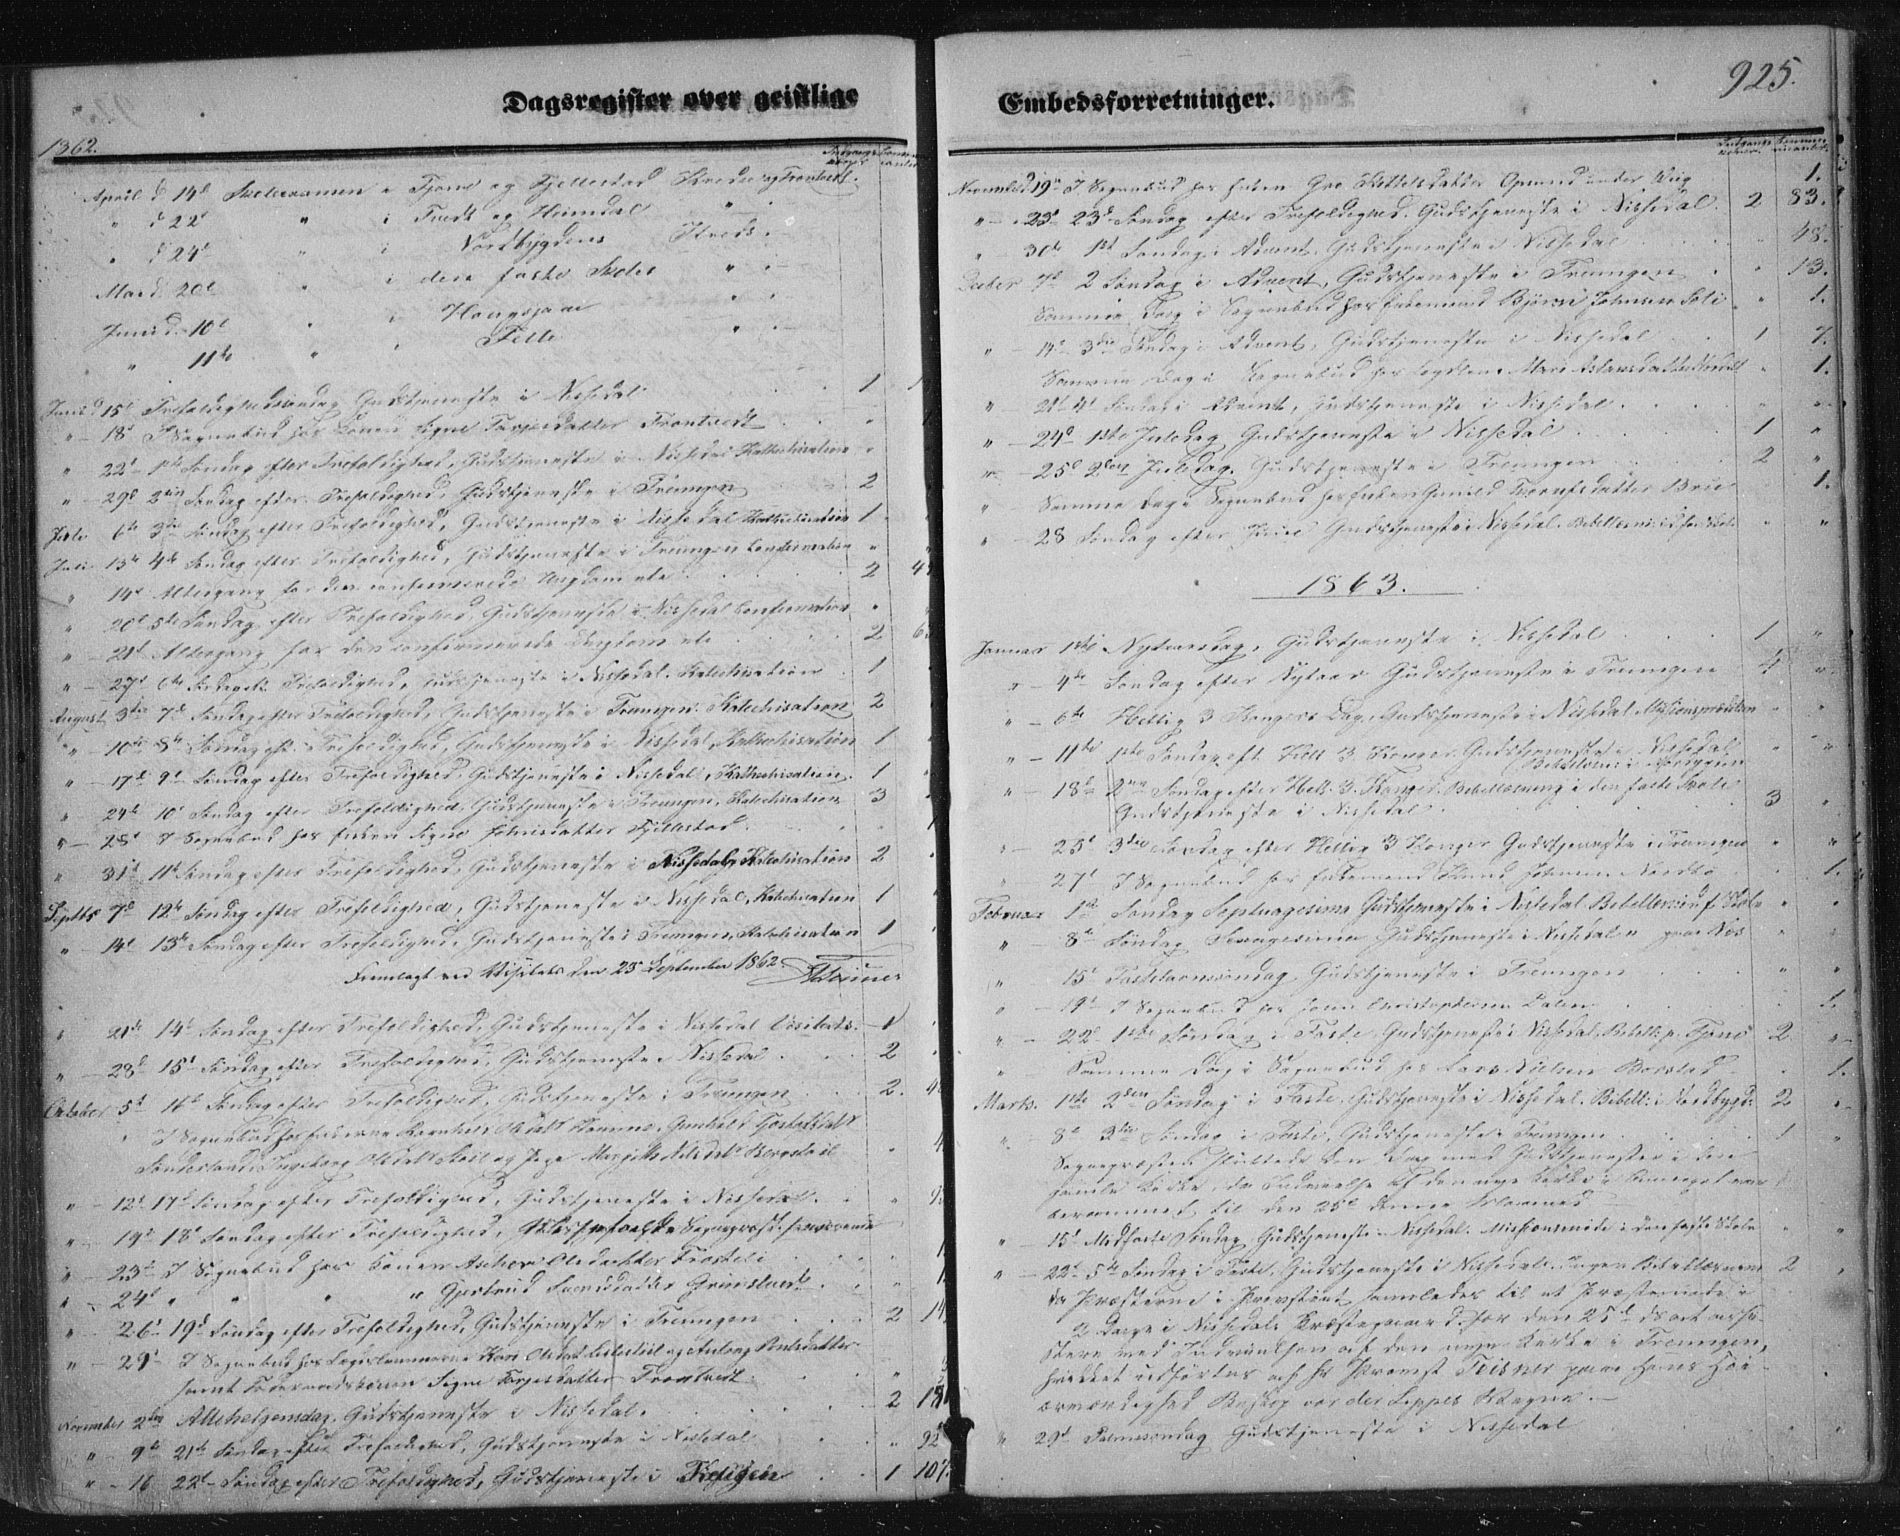 SAKO, Nissedal kirkebøker, F/Fa/L0003: Ministerialbok nr. I 3, 1846-1870, s. 924-925